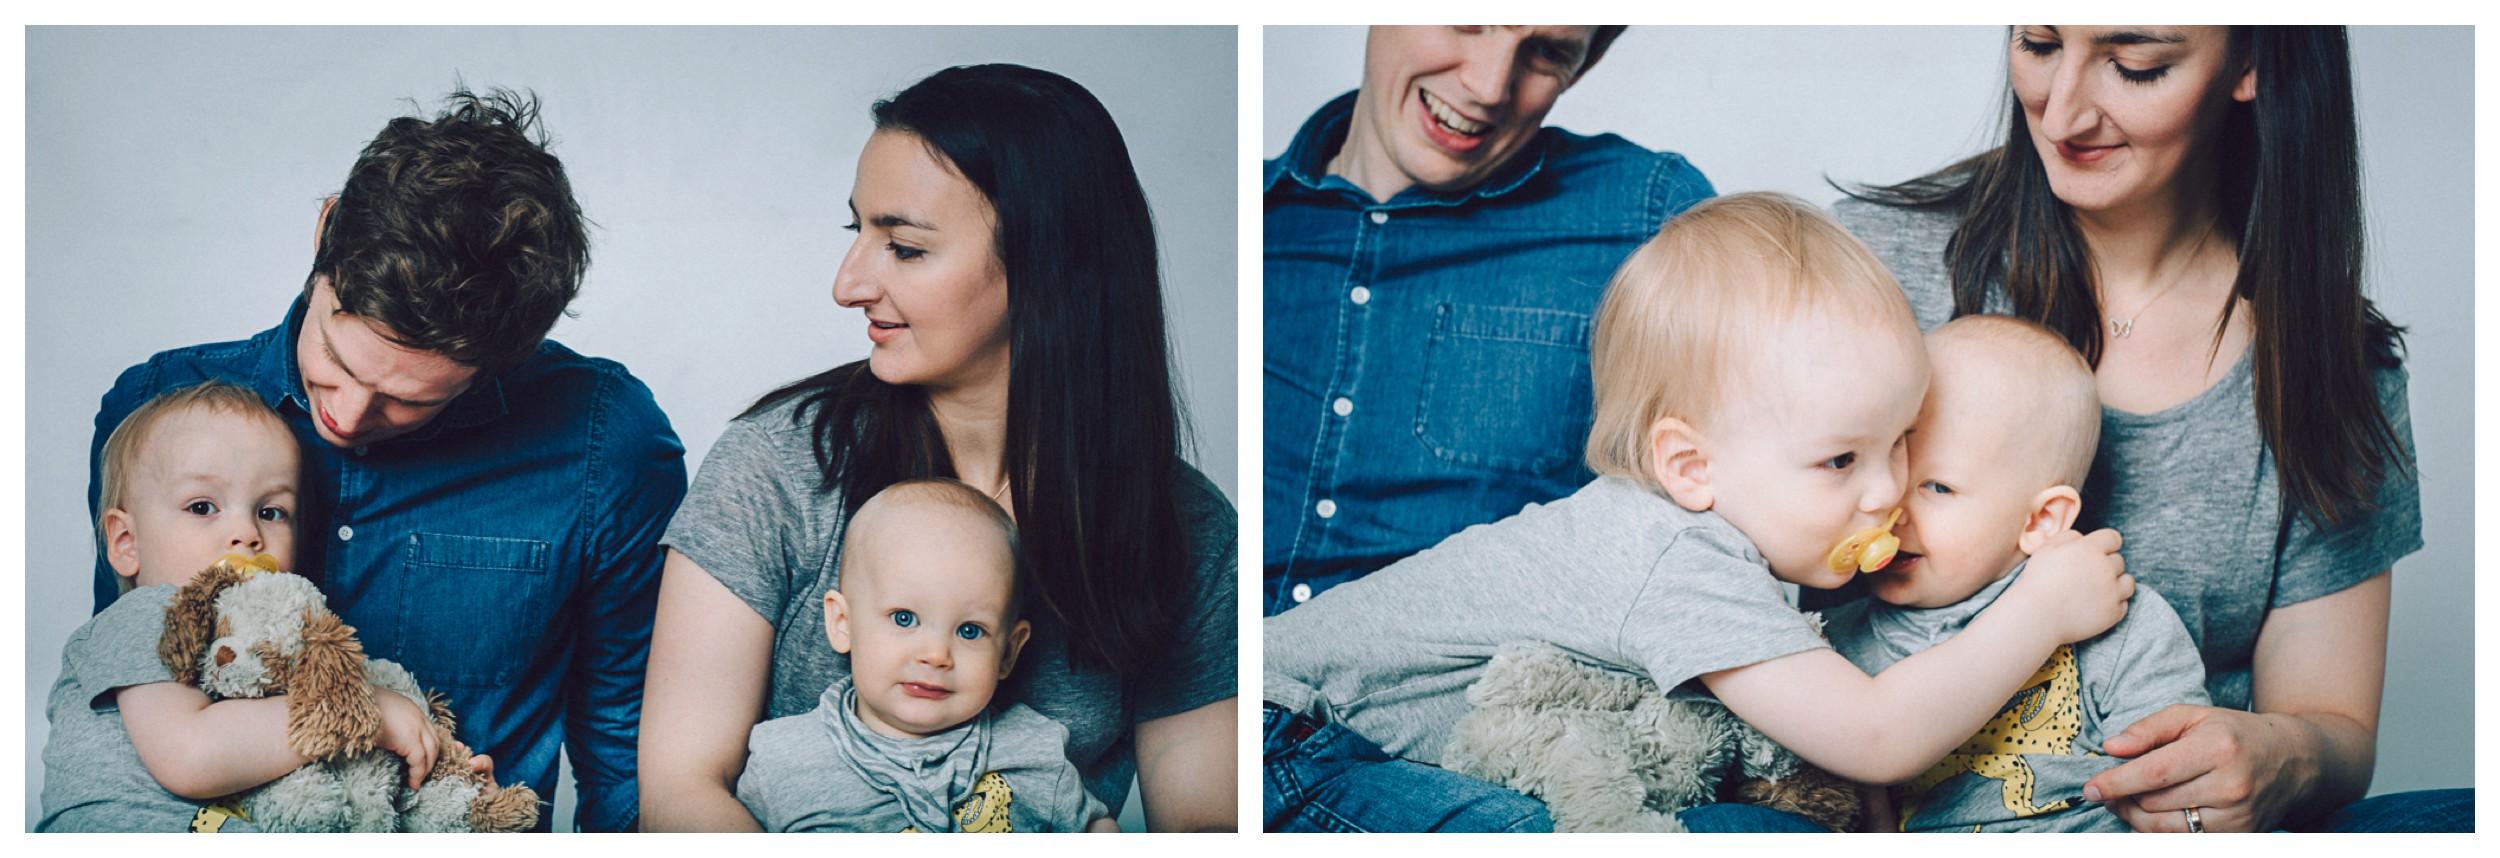 familjefotograf stockholm,familjefotograf vallentuna, familjefotograf bagarmossen, familjefotografering i stockholm, familjefoto, barnfotograf stockholm, studiofotograf, linda rehlin, cecilia pihl,